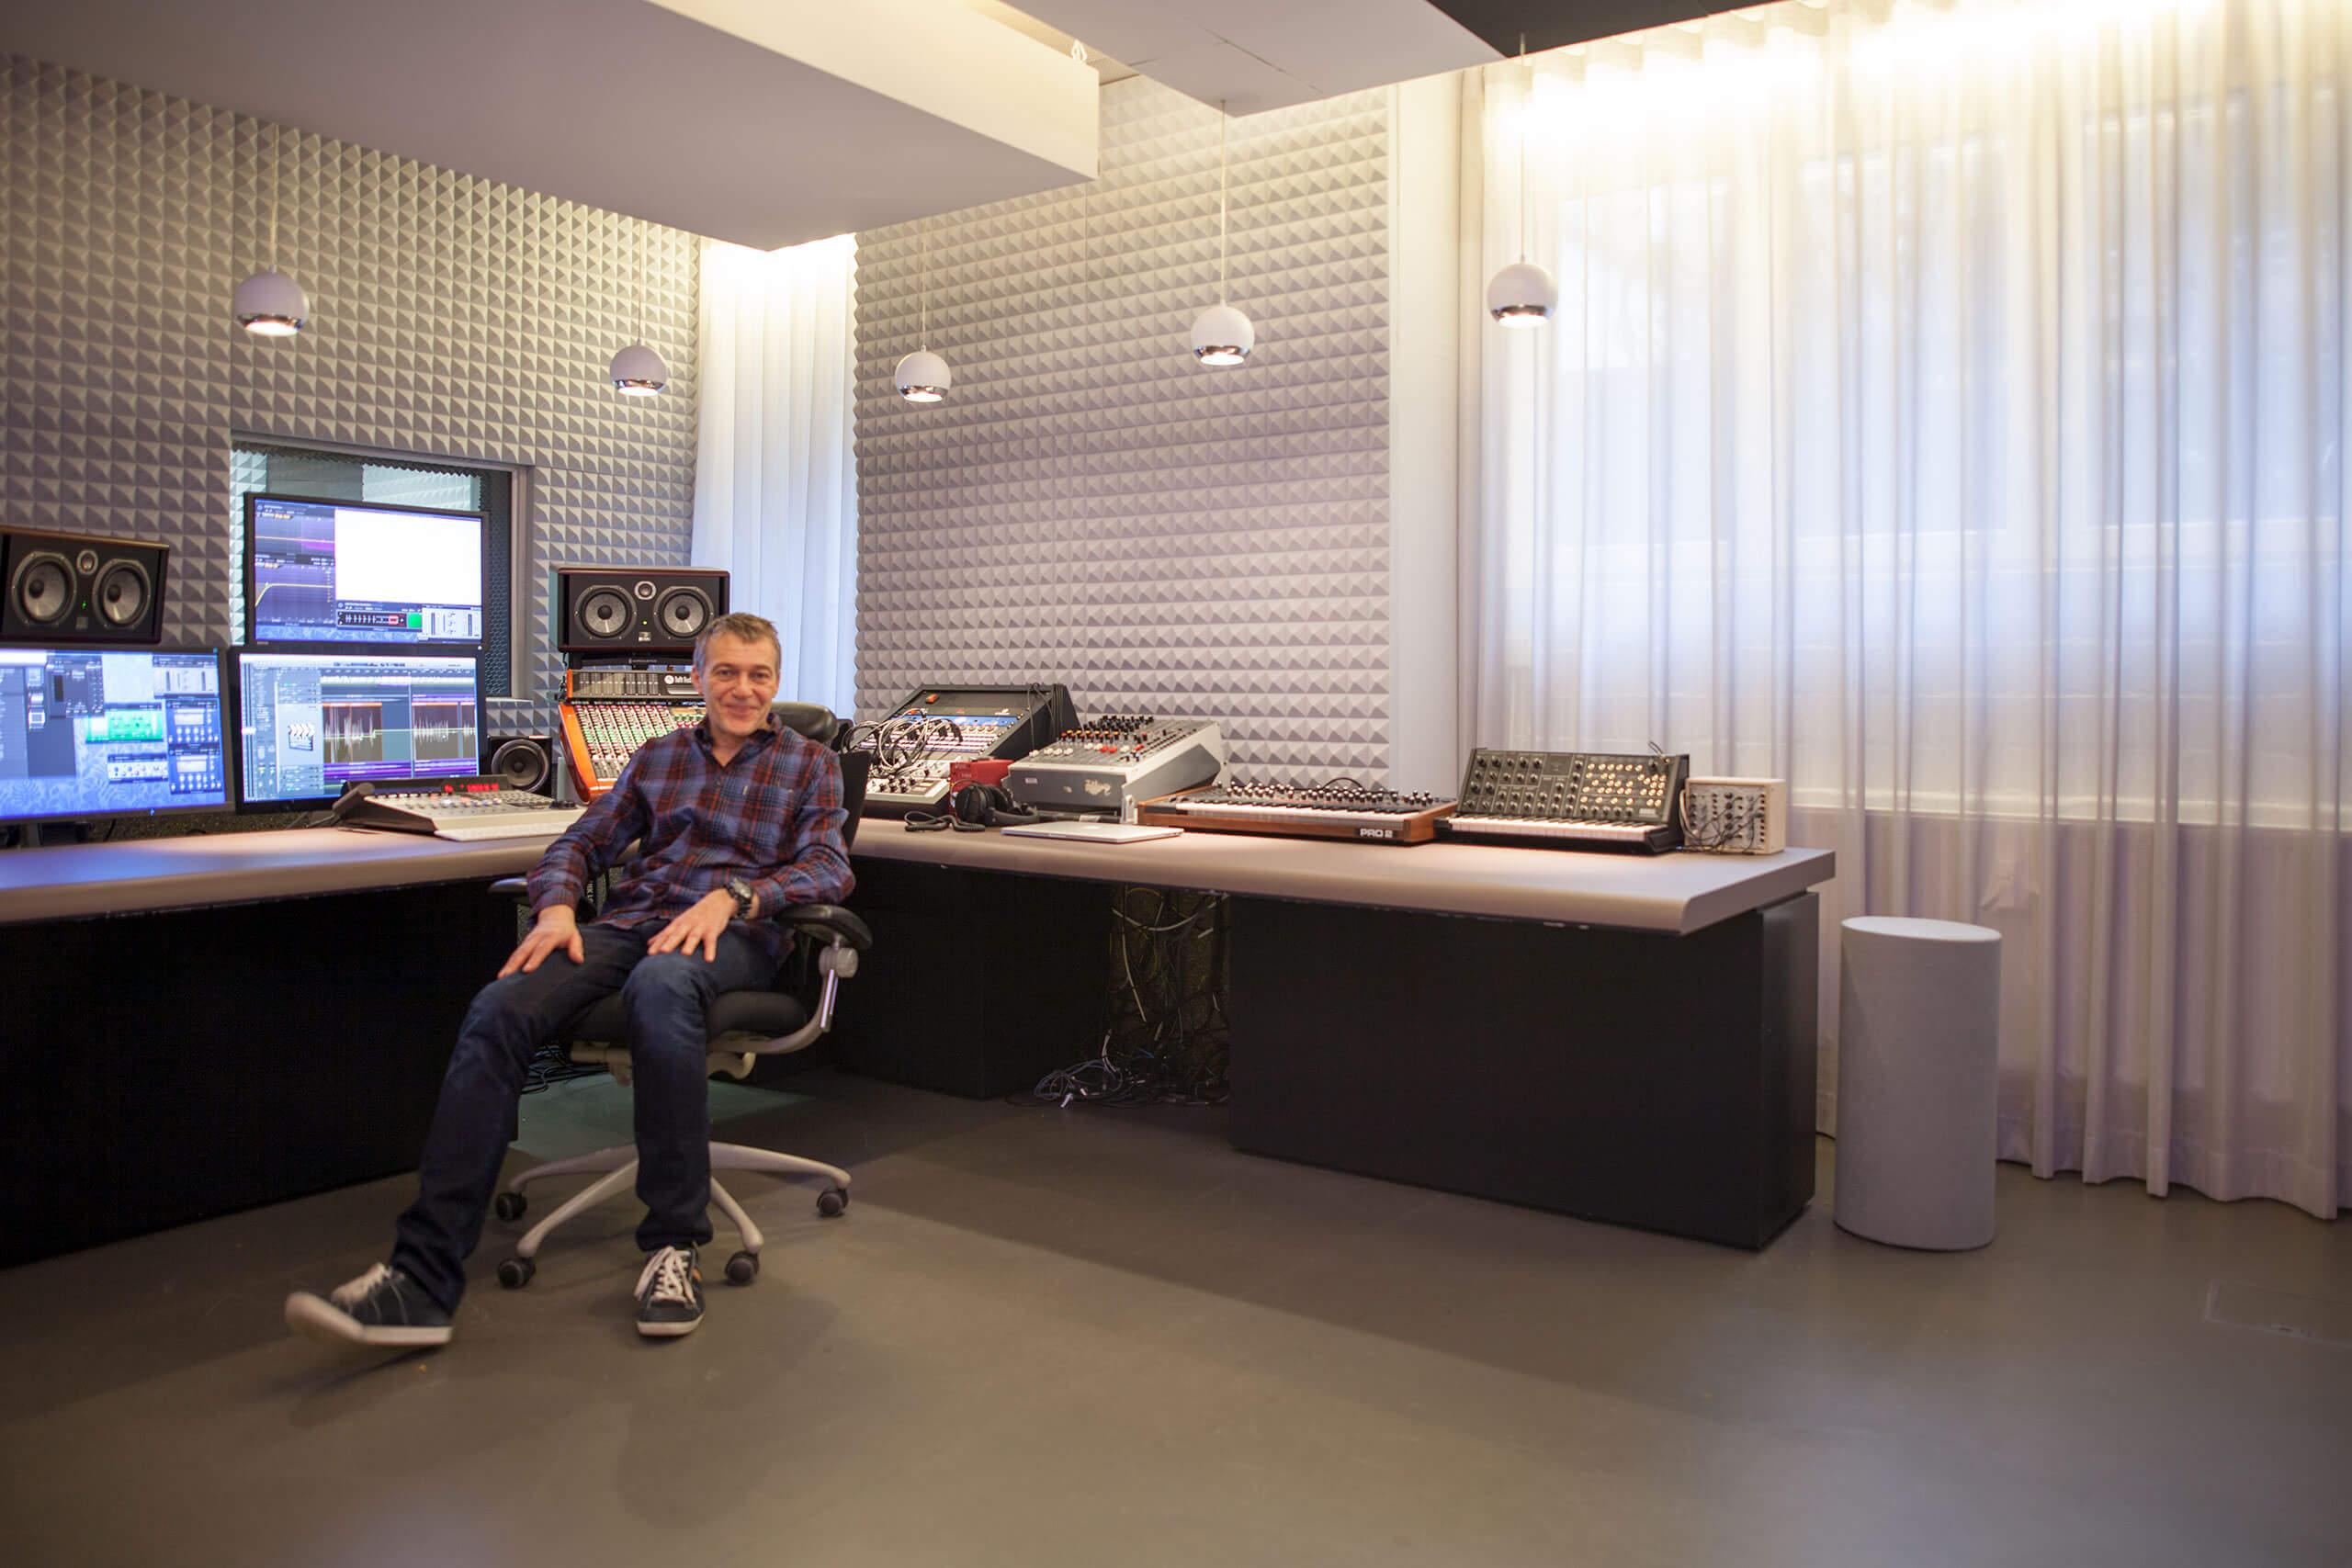 Akustik Vorhang Set : Akustikstoffe für rekorder studios berlin kreuzberg adler wohndesign